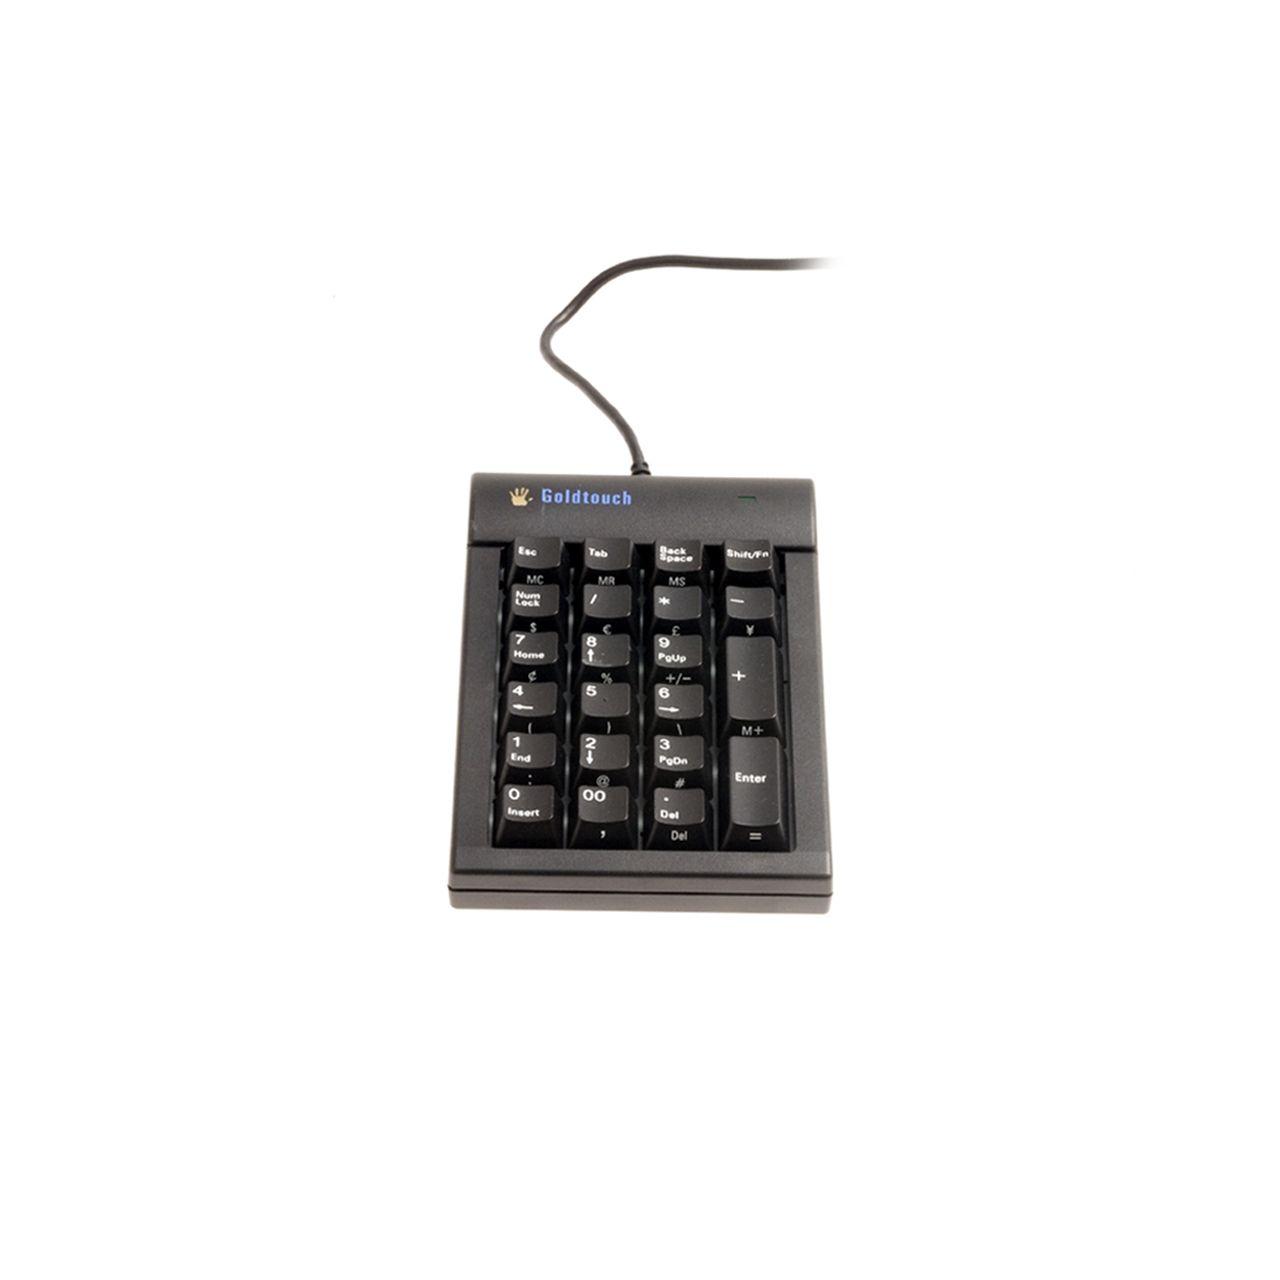 goldtouch nummeriek toetsenbord bedraad ERKAGOI301 Voorkant Zwart